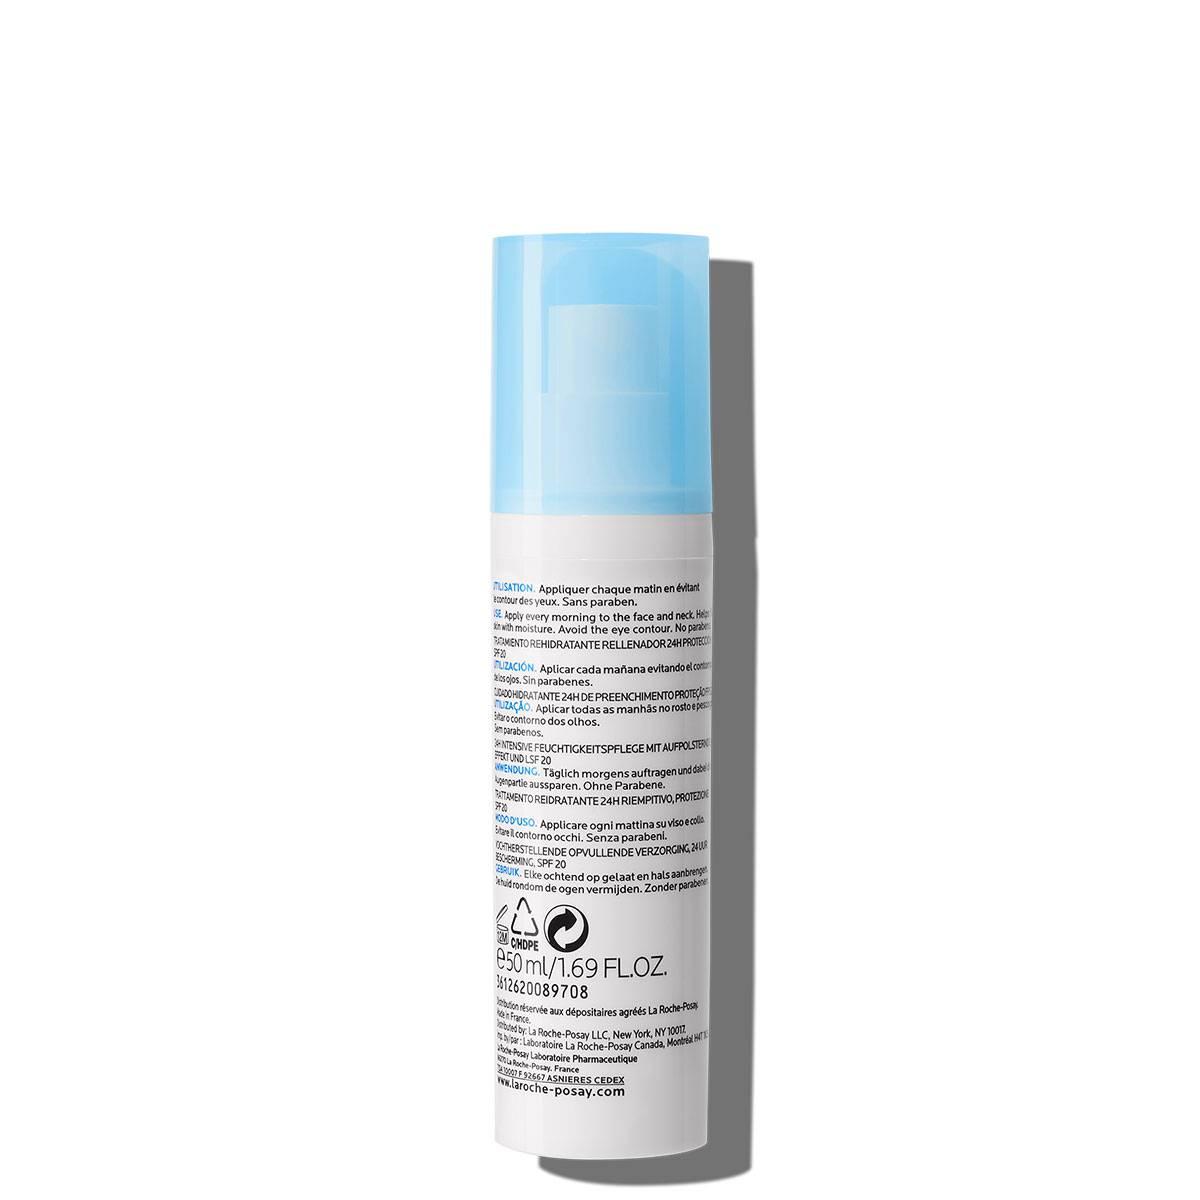 La Roche Posay ProductPage Hydraphase UV Intense Rich Spf20 50ml 33378